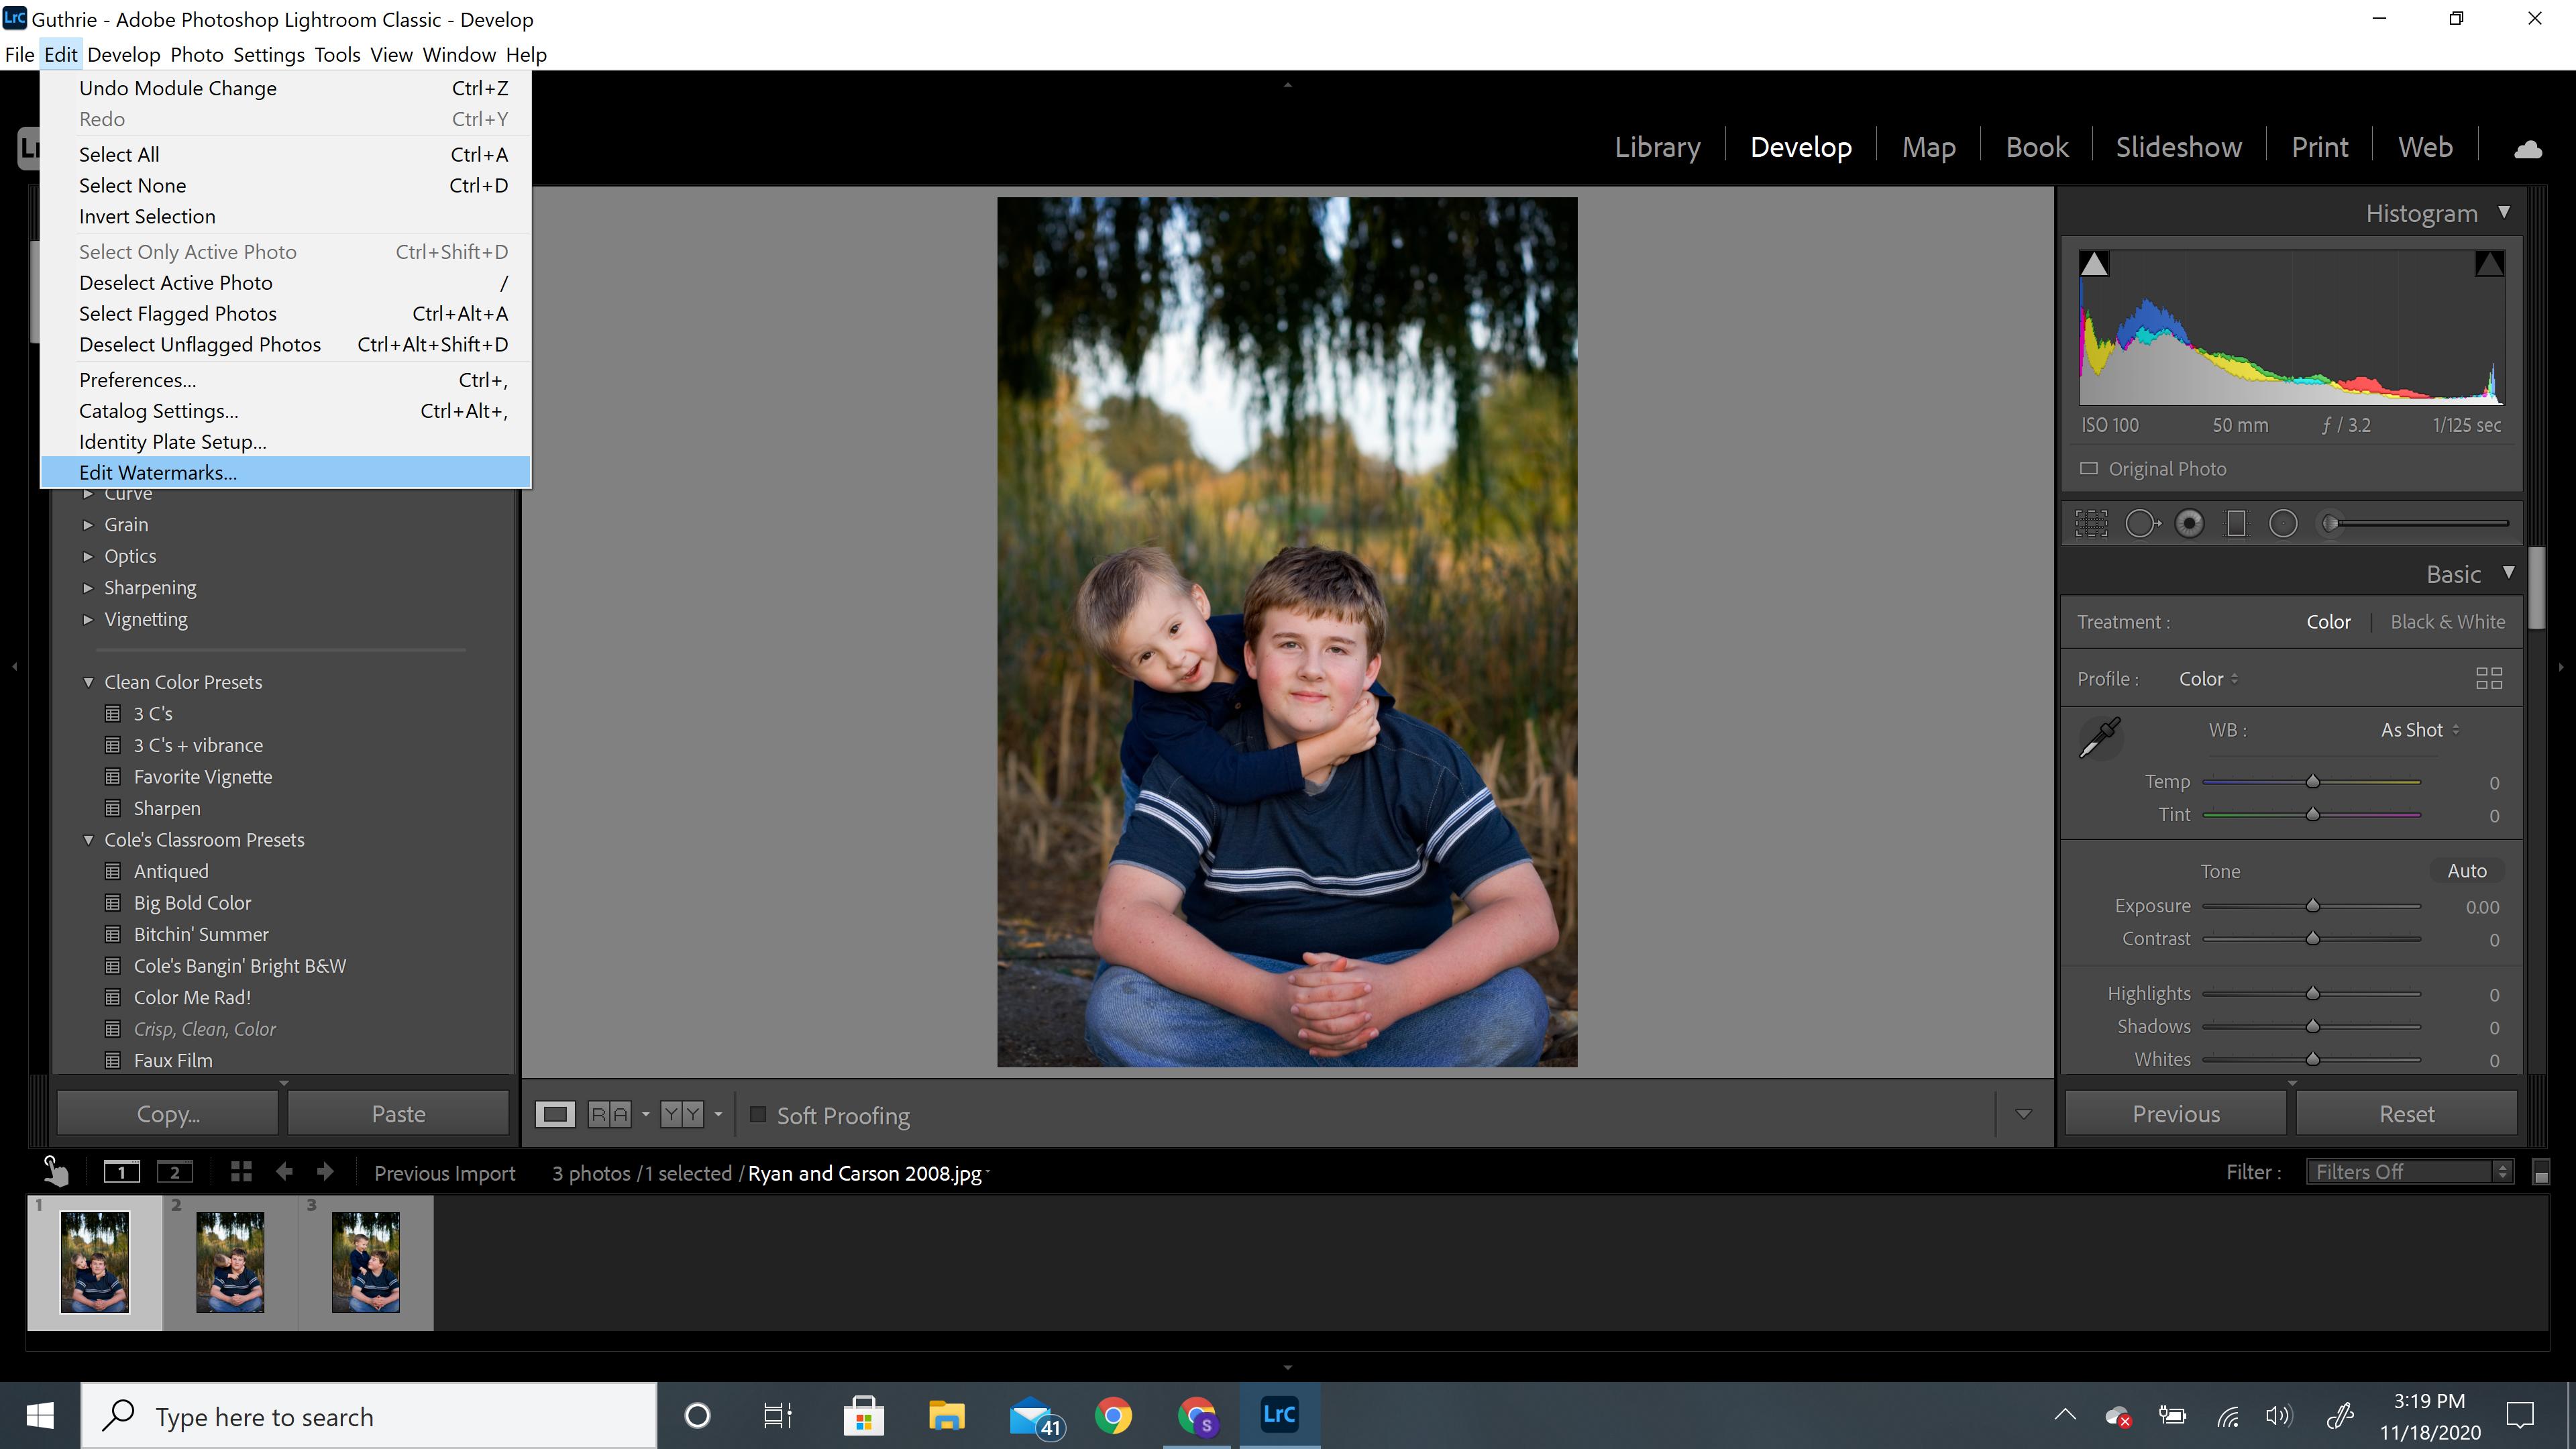 select edit watermarks